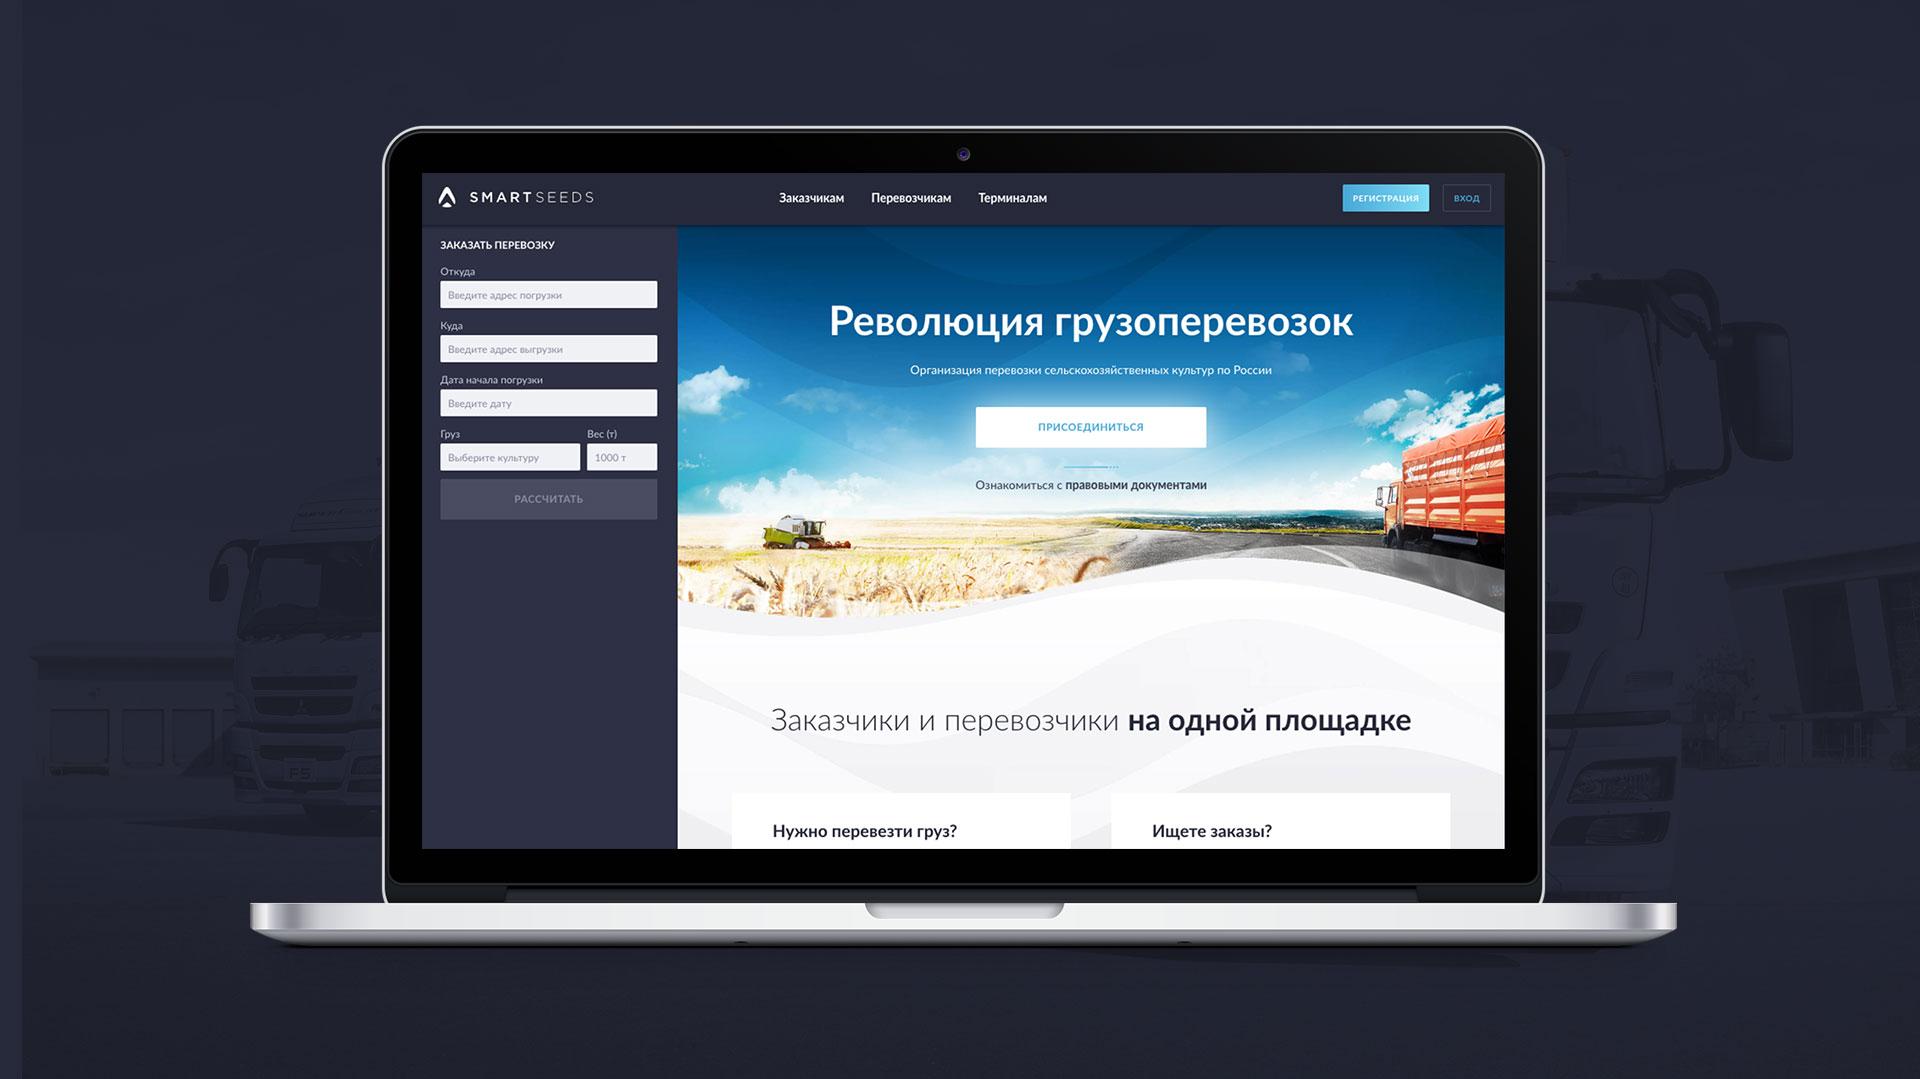 SmartSeeds — революция грузоперевозок